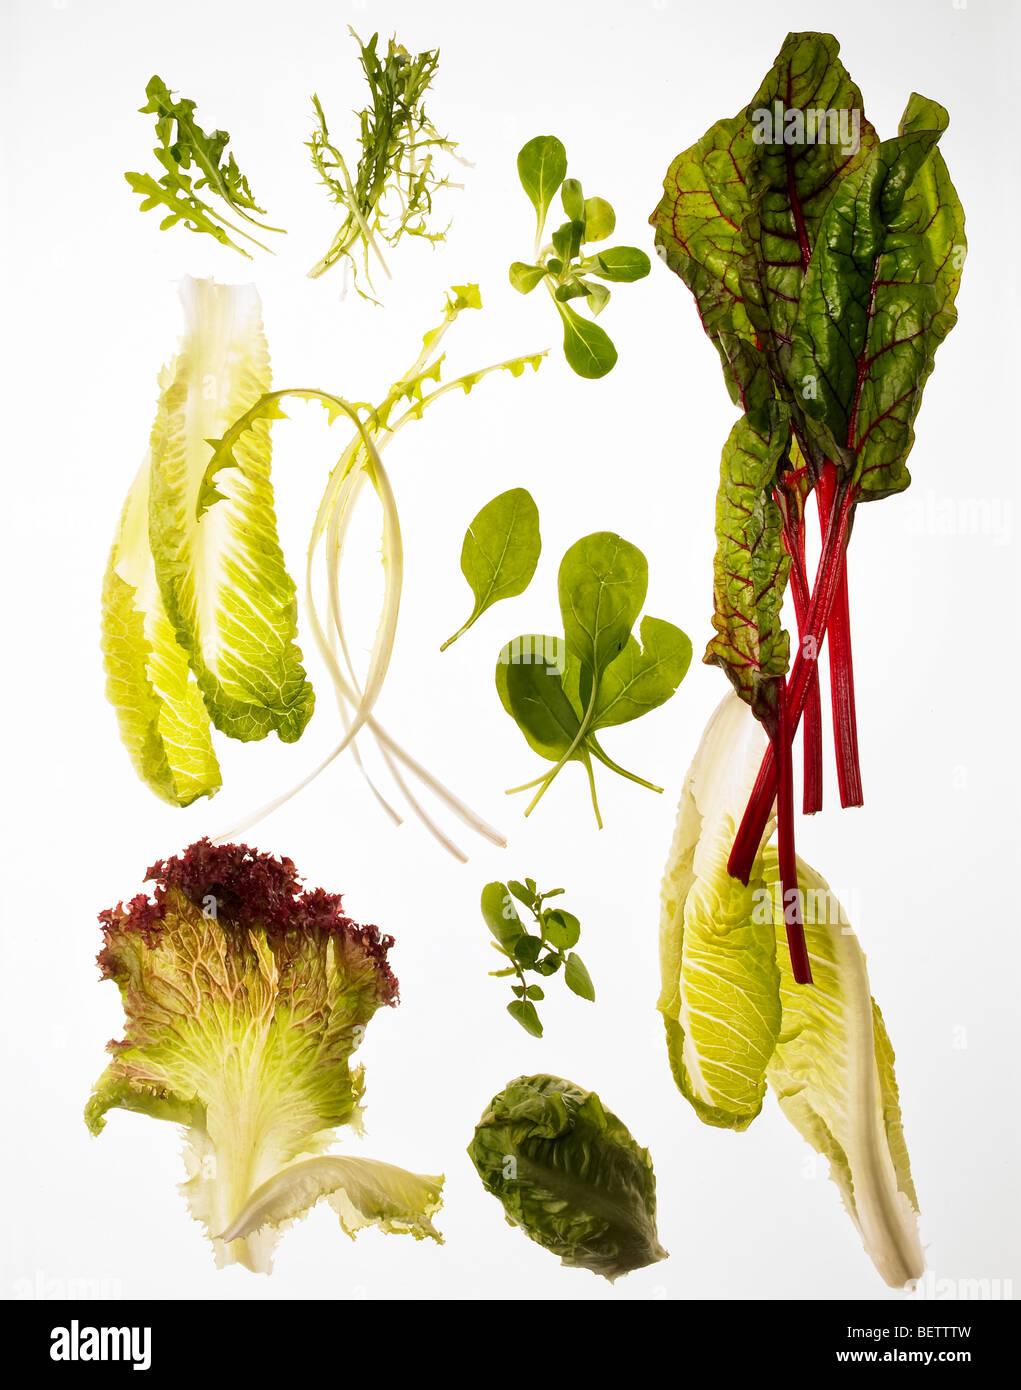 Ensalada de hojas verdes diferentes ingredientes, adecuado para ensaladas. Imagen De Stock